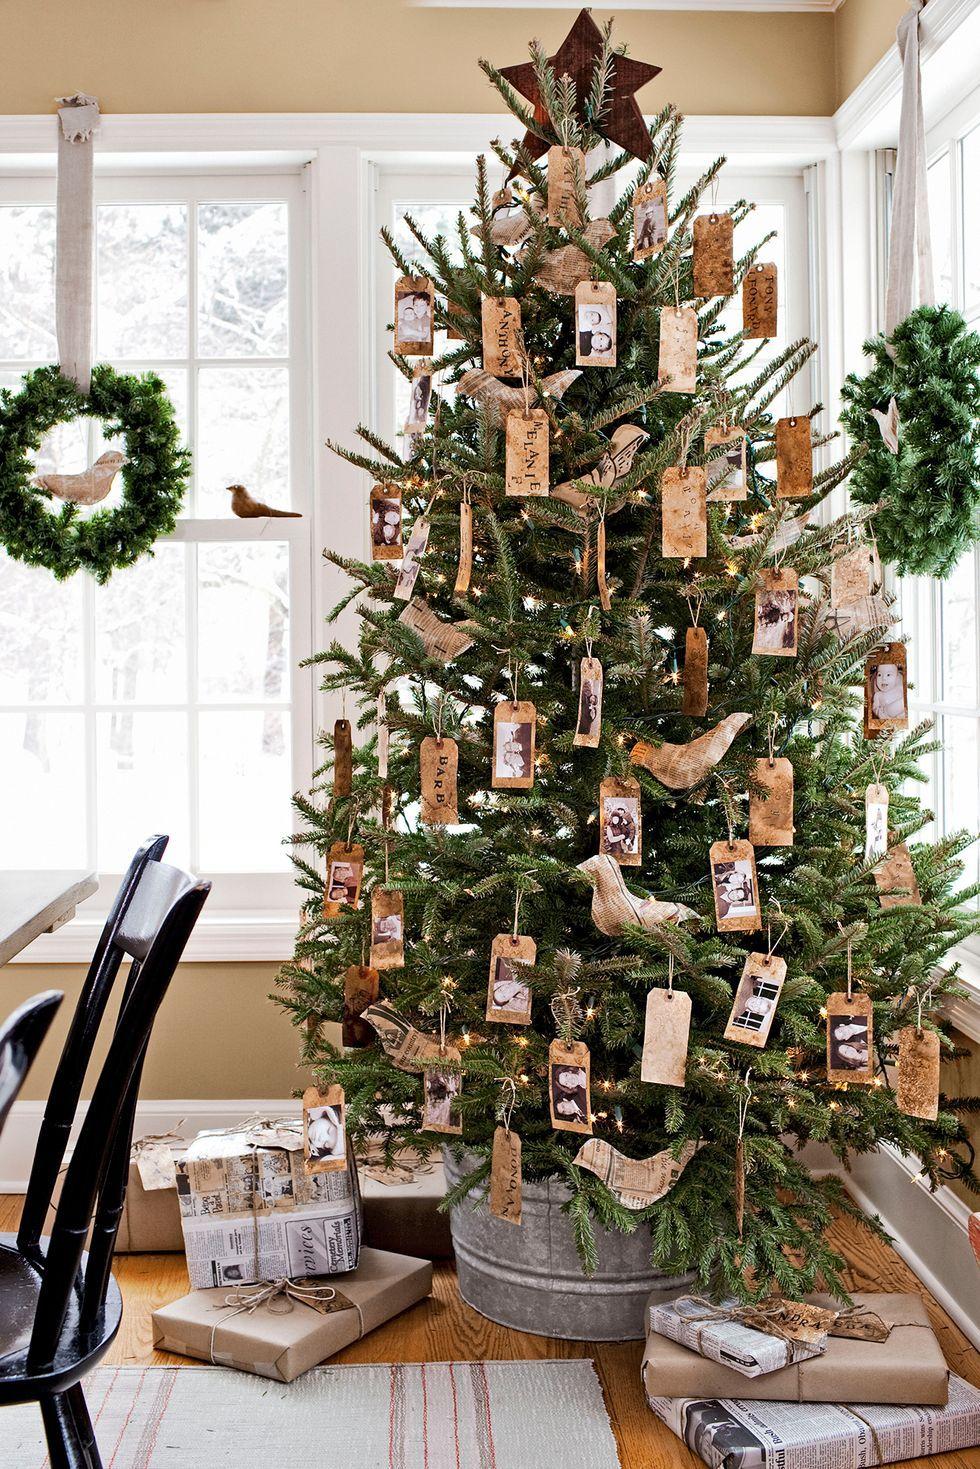 50 Statement Christmas Tree Decor Ideas To Try Now In 2020 Christmas Tree Decorations Cool Christmas Trees Christmas Tree